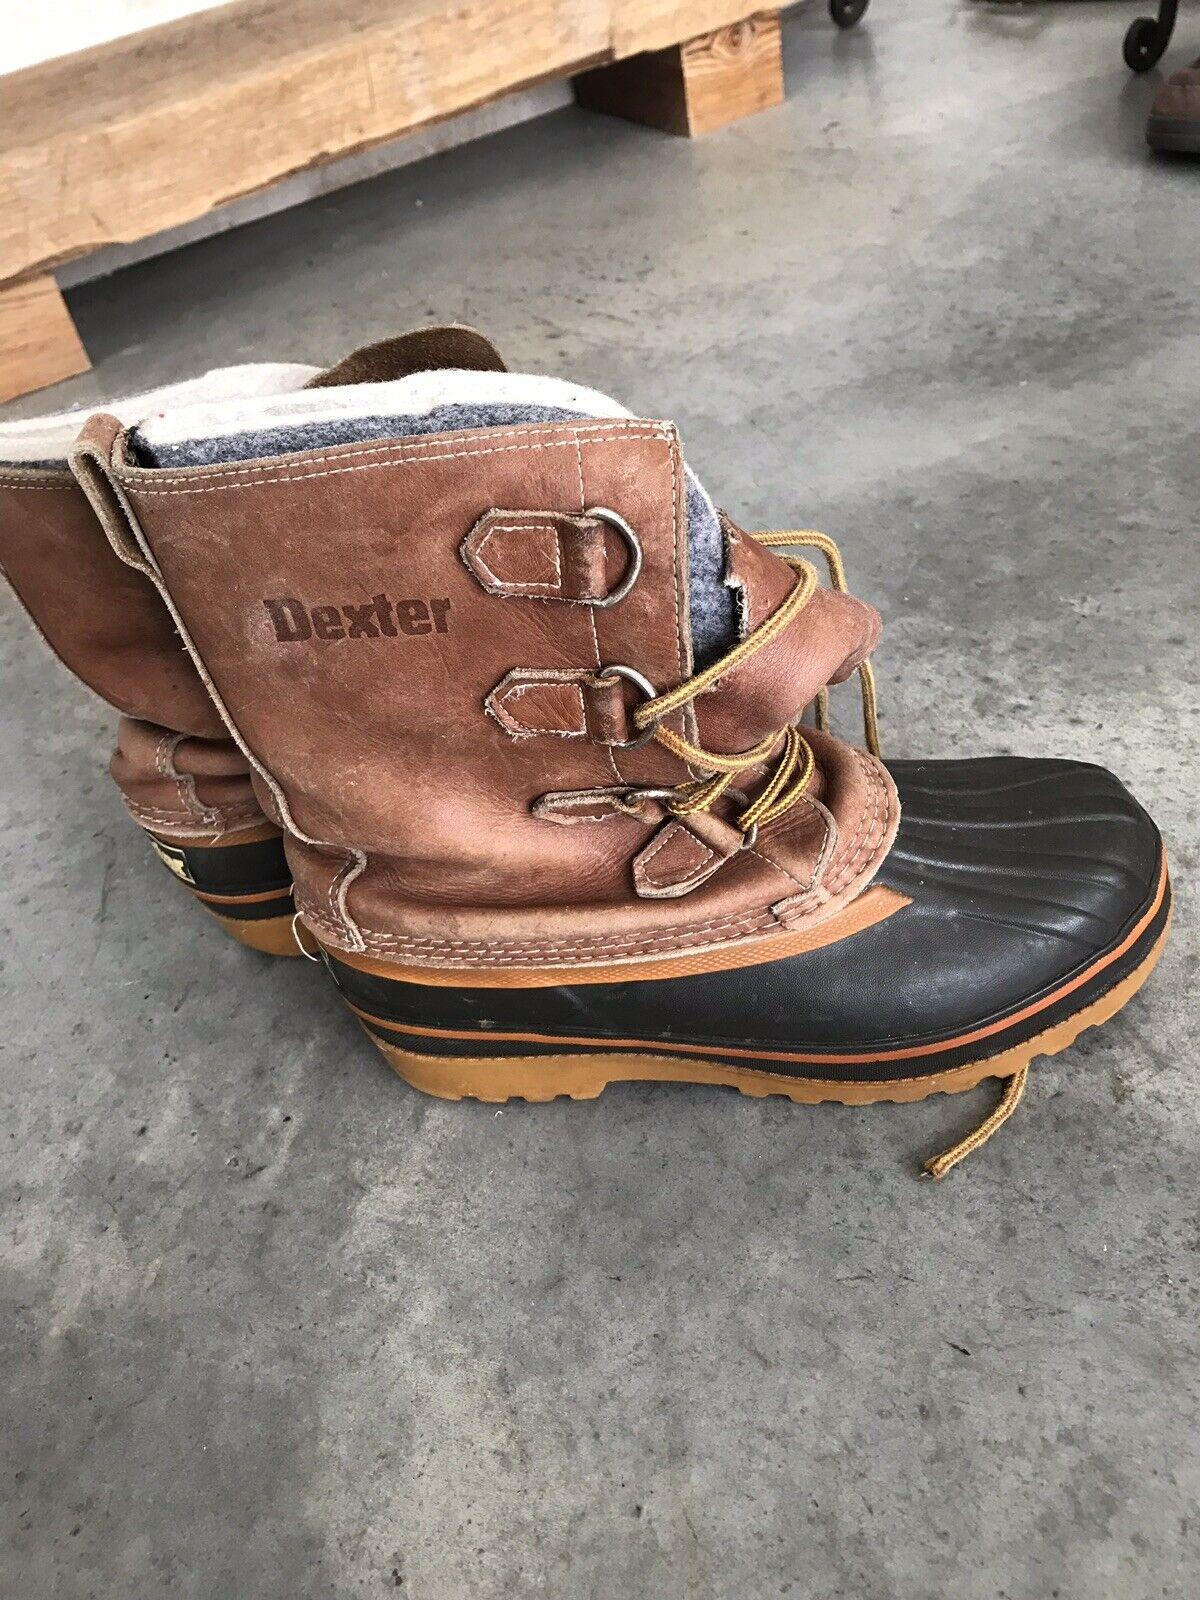 Dexter Mens mens Steel Shank Brown Leather Boots B SZ 7